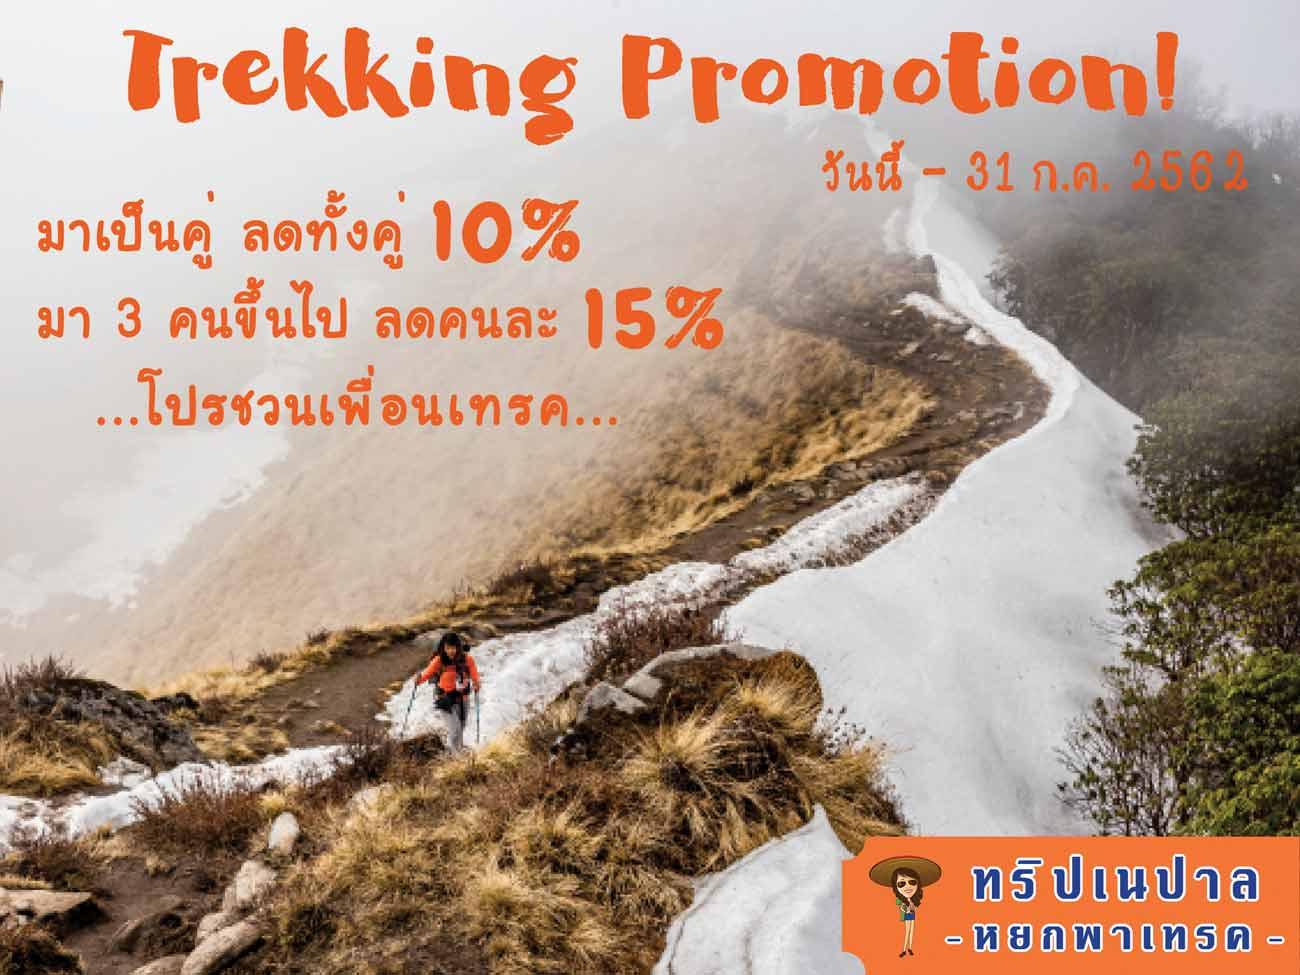 Trekking Promotion โปรส่วนลด Mohare Danda Khopra Danda Mardi Himal